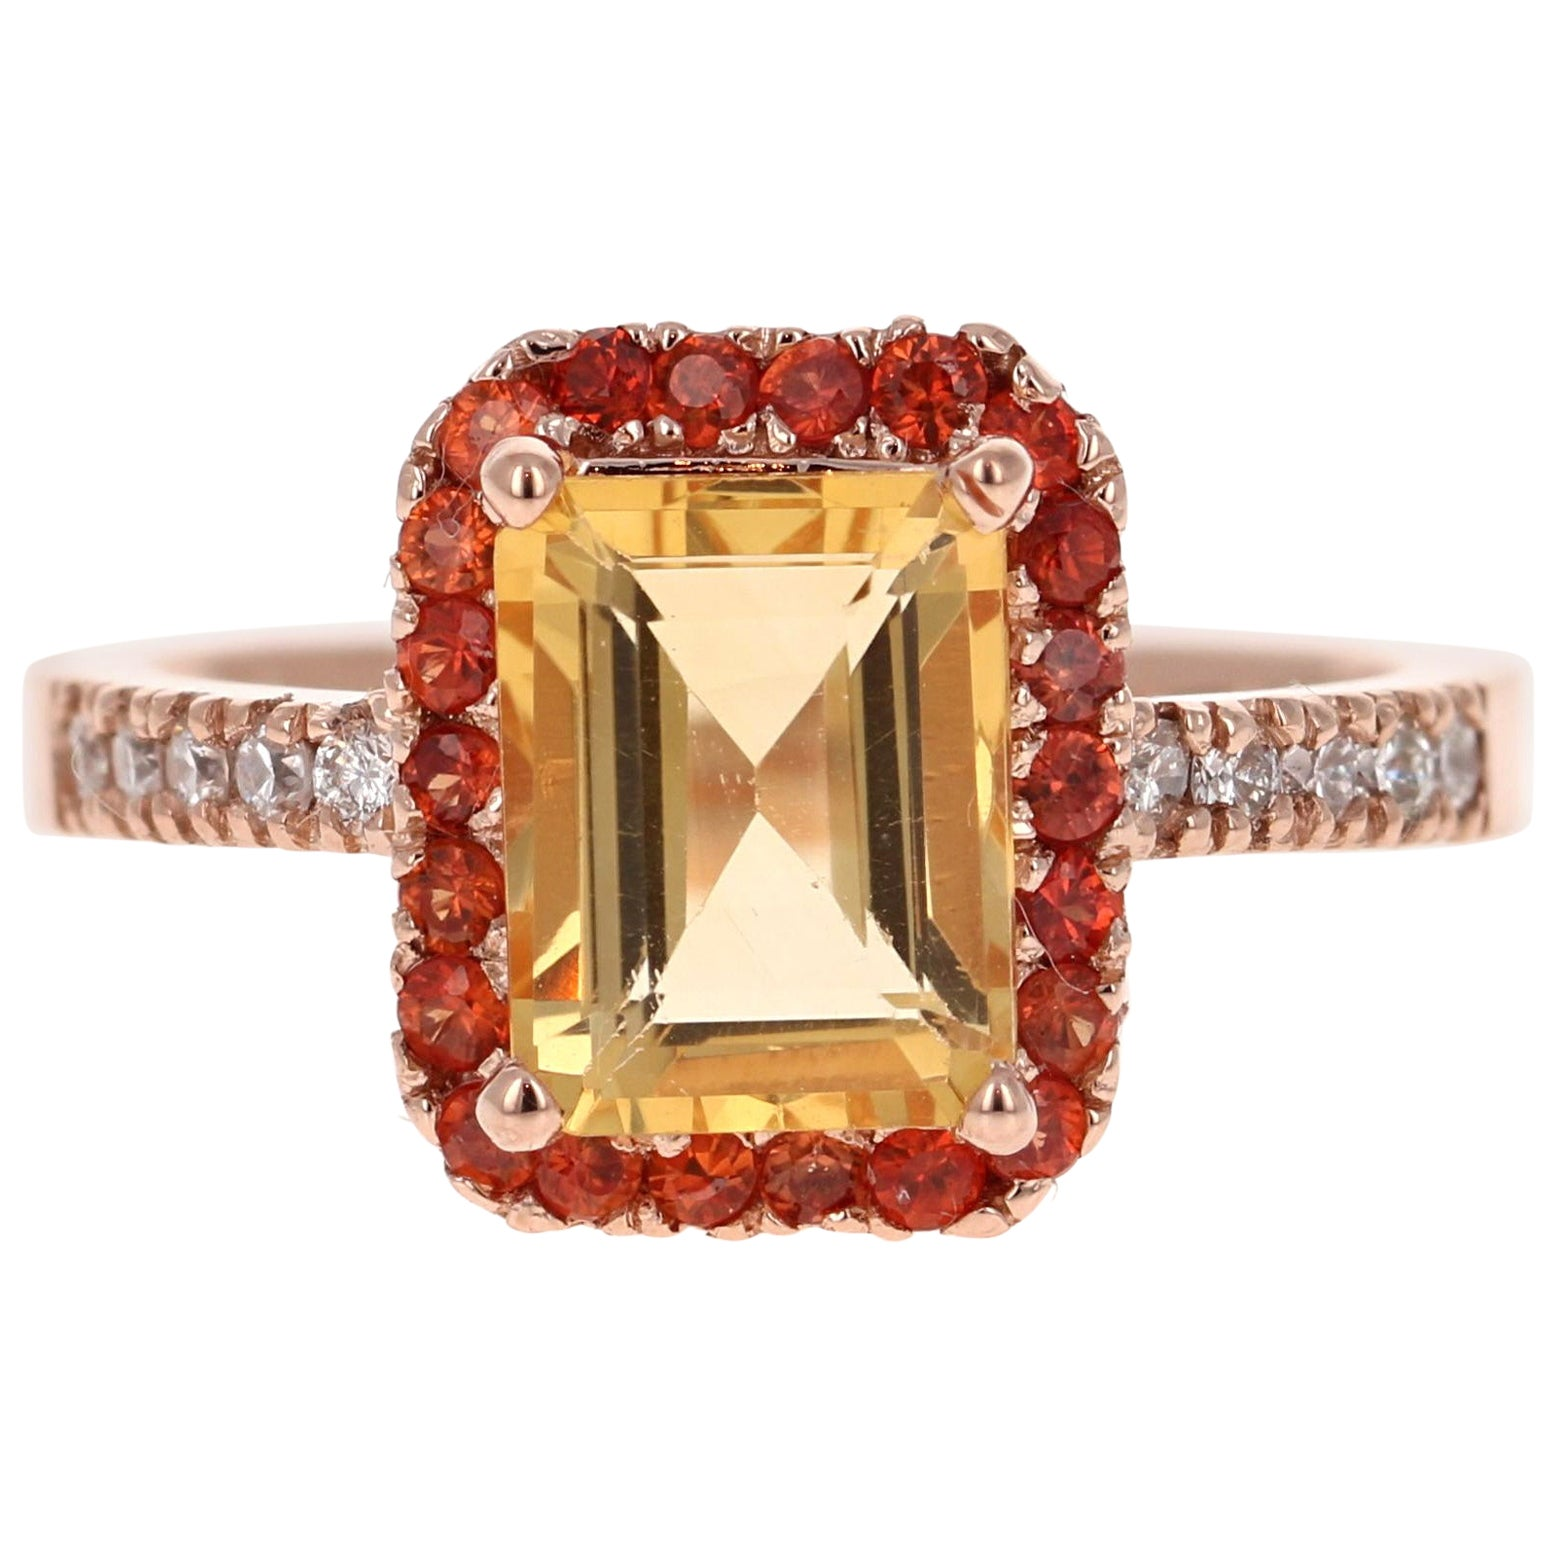 2.91 Carat Emerald Cut Citrine, Sapphire Diamond 14 Karat Gold Engagement Ring